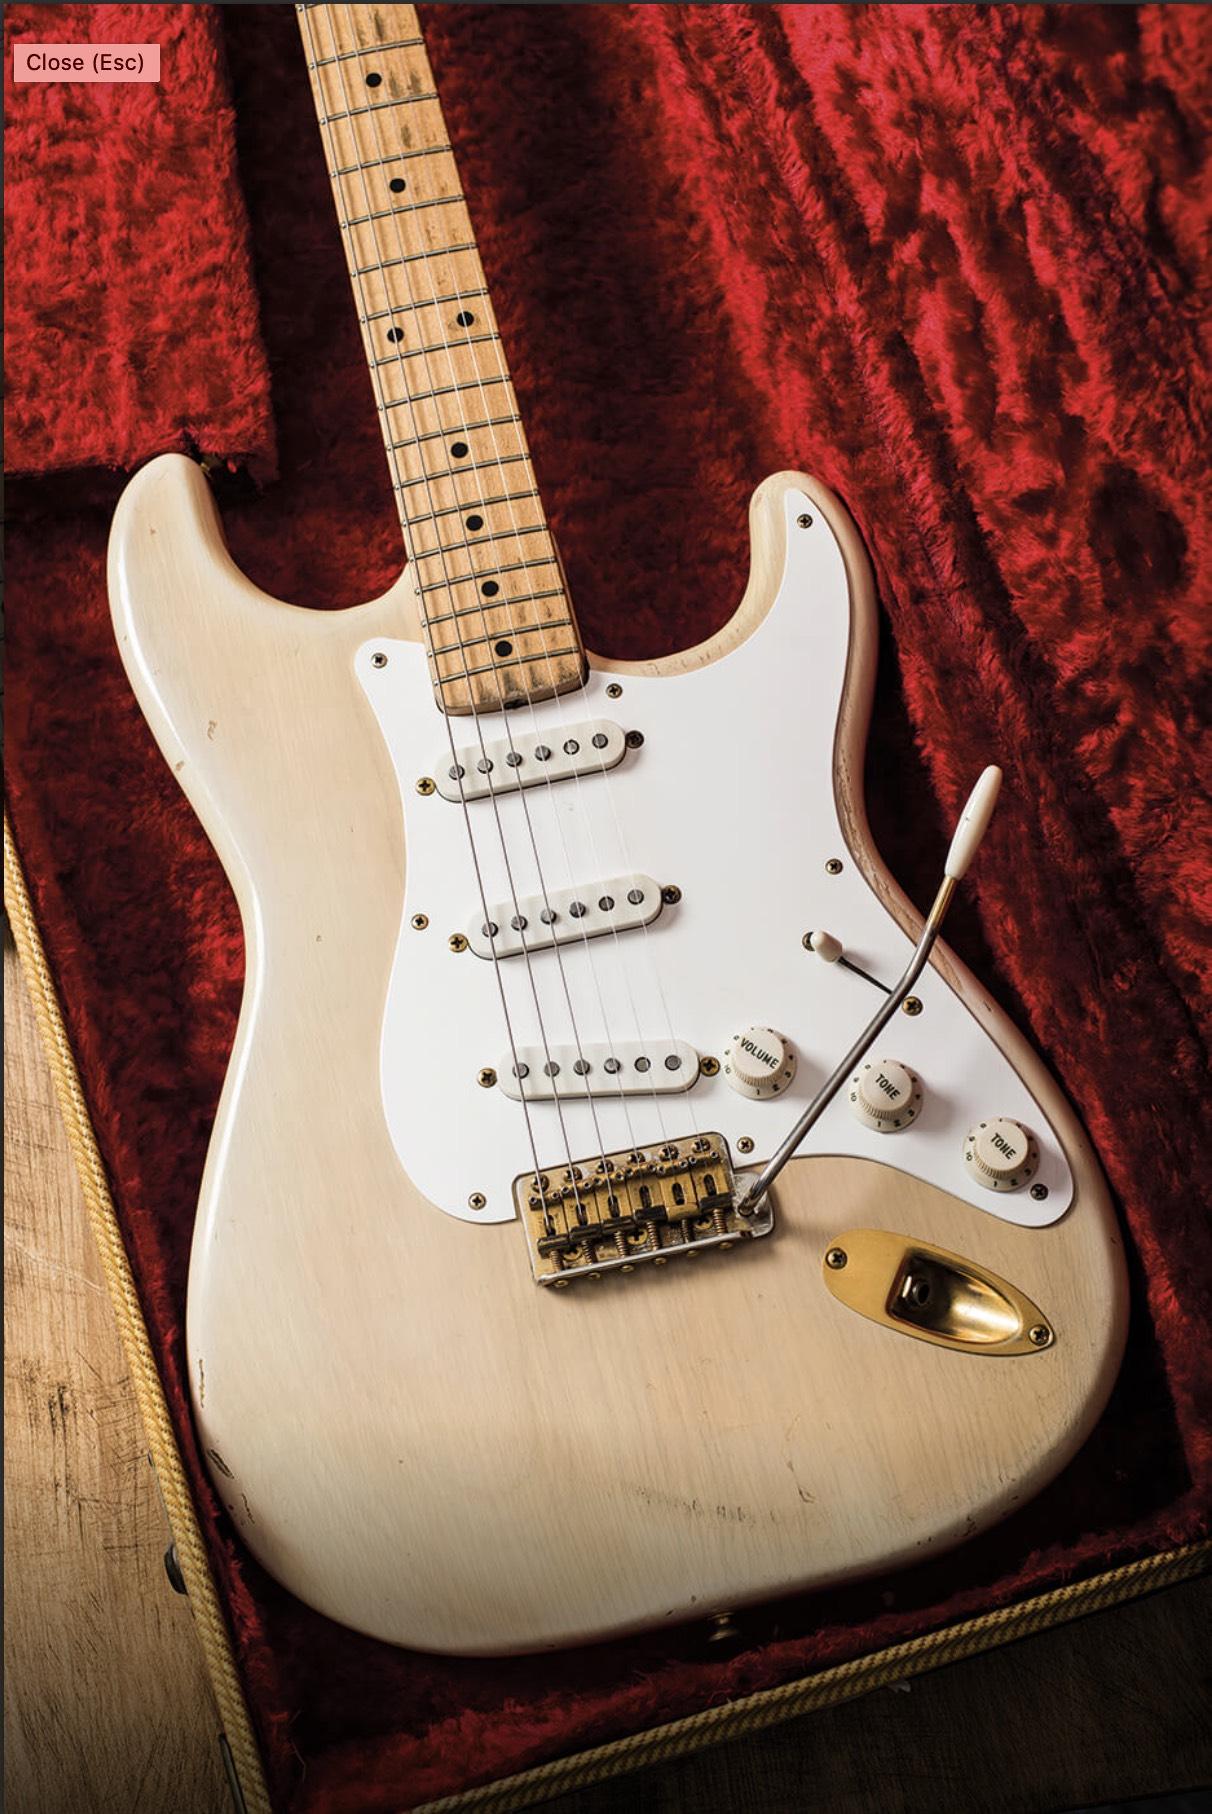 1957 Fender 'Mary Kaye' Stratocaster